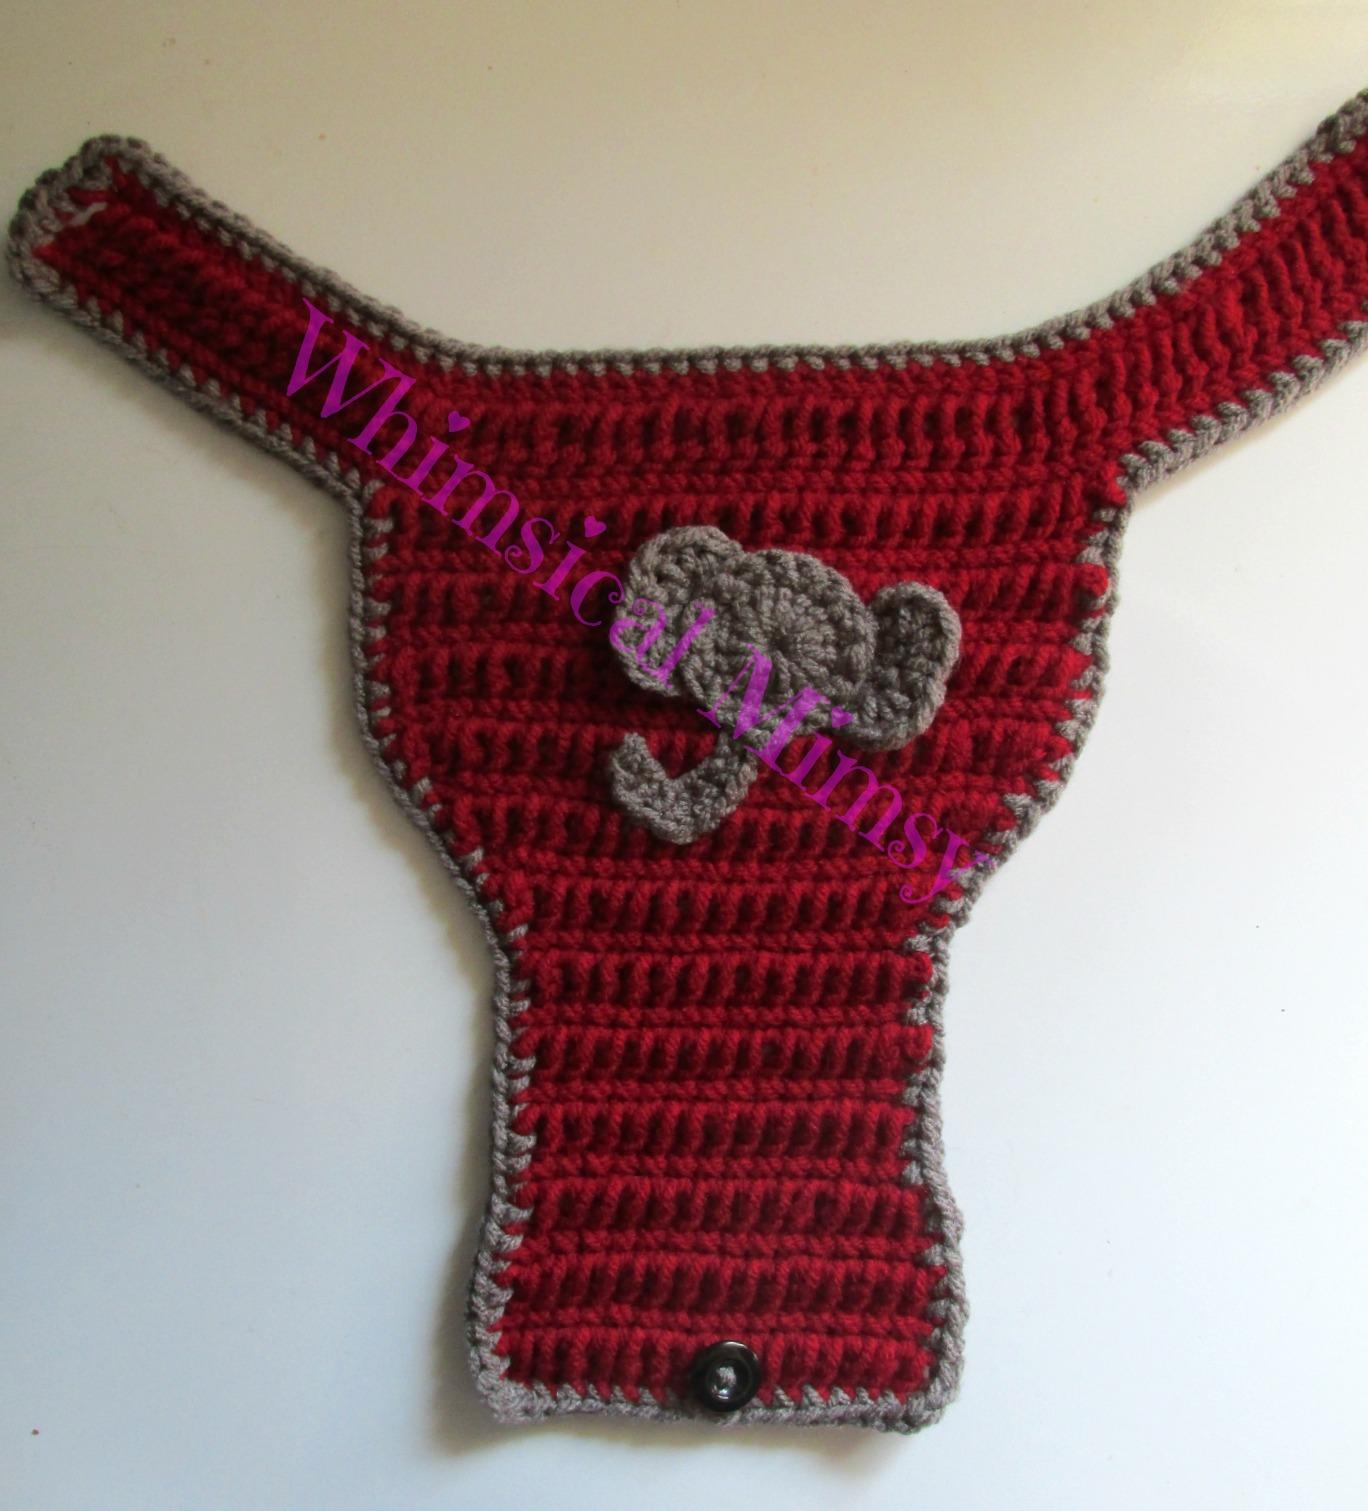 50cb6cd8159 ... Crochet Alabama Football Inspired Newborn Hat and Diaper Cover Set  Photo Prop - Thumbnail 3 ...